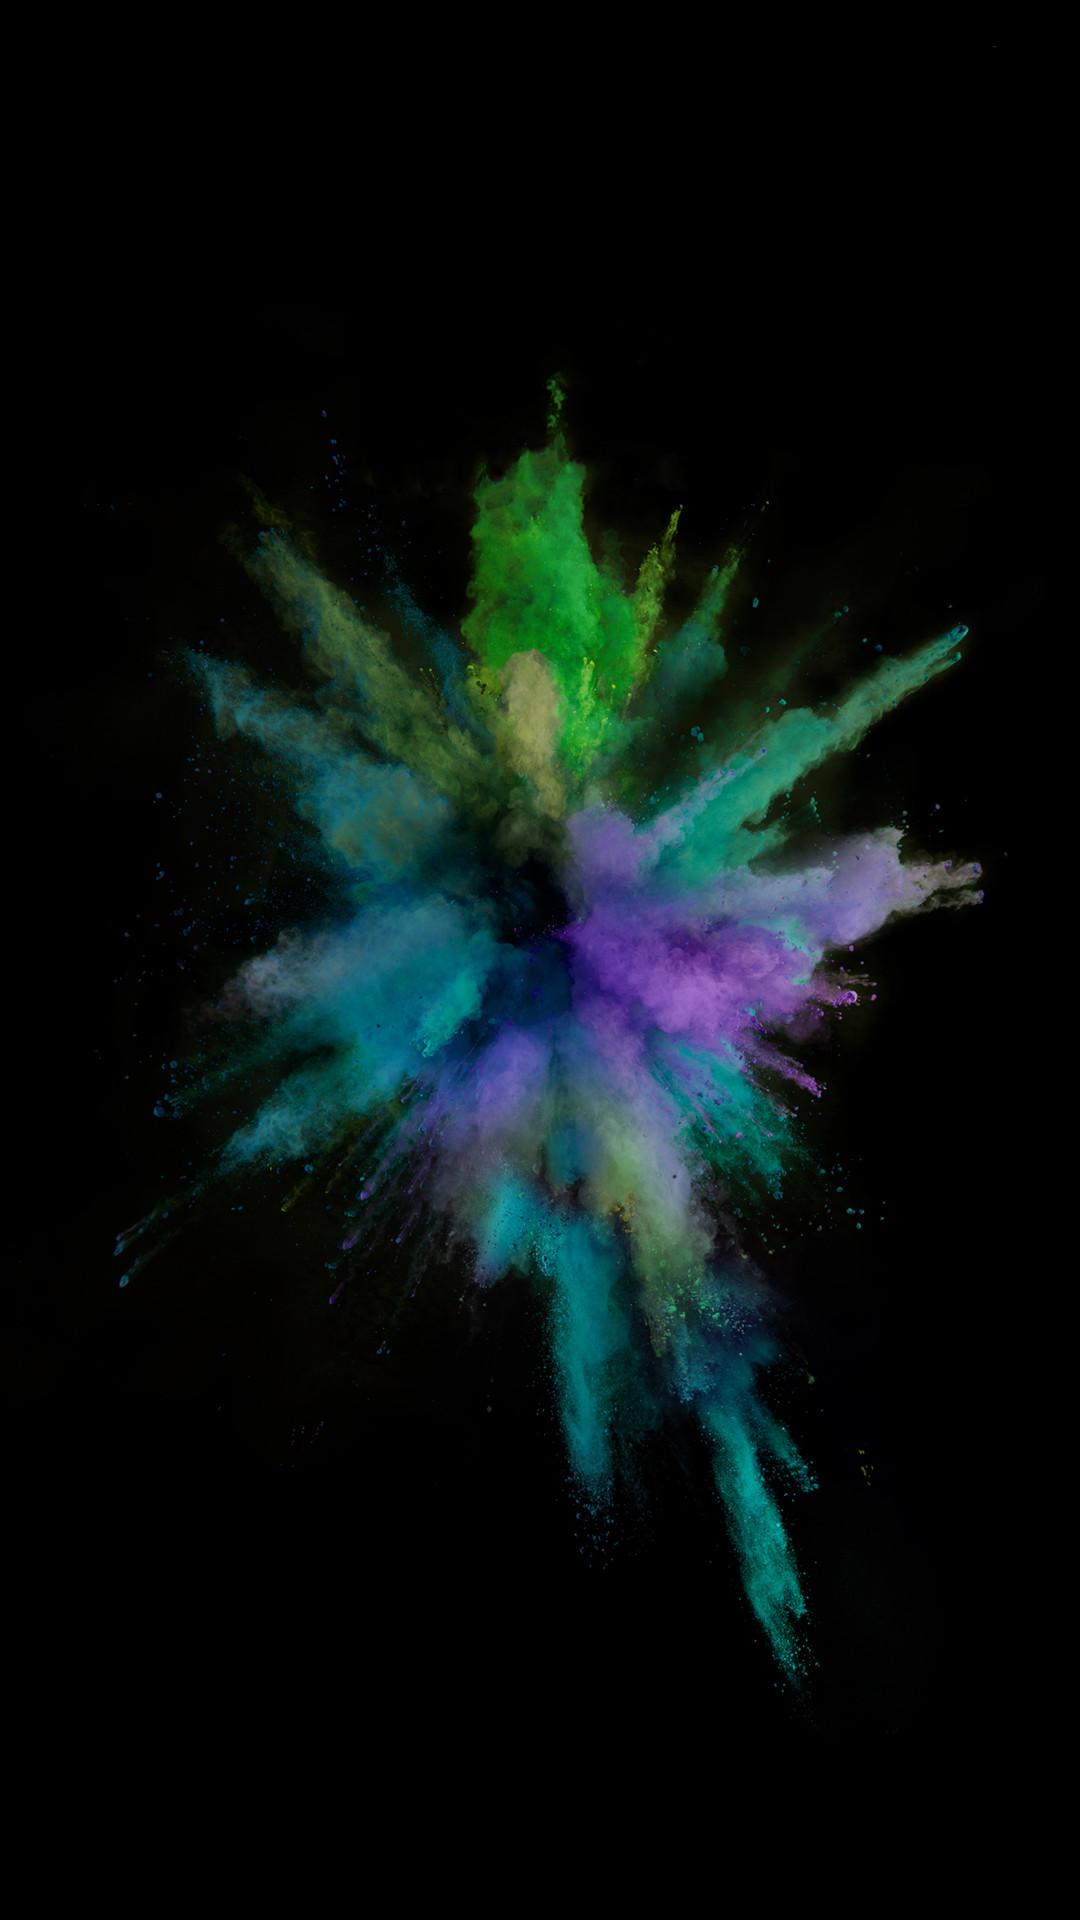 iOS9 Colorful Smoke Explosion Dark Art iPhone 8 wallpaper